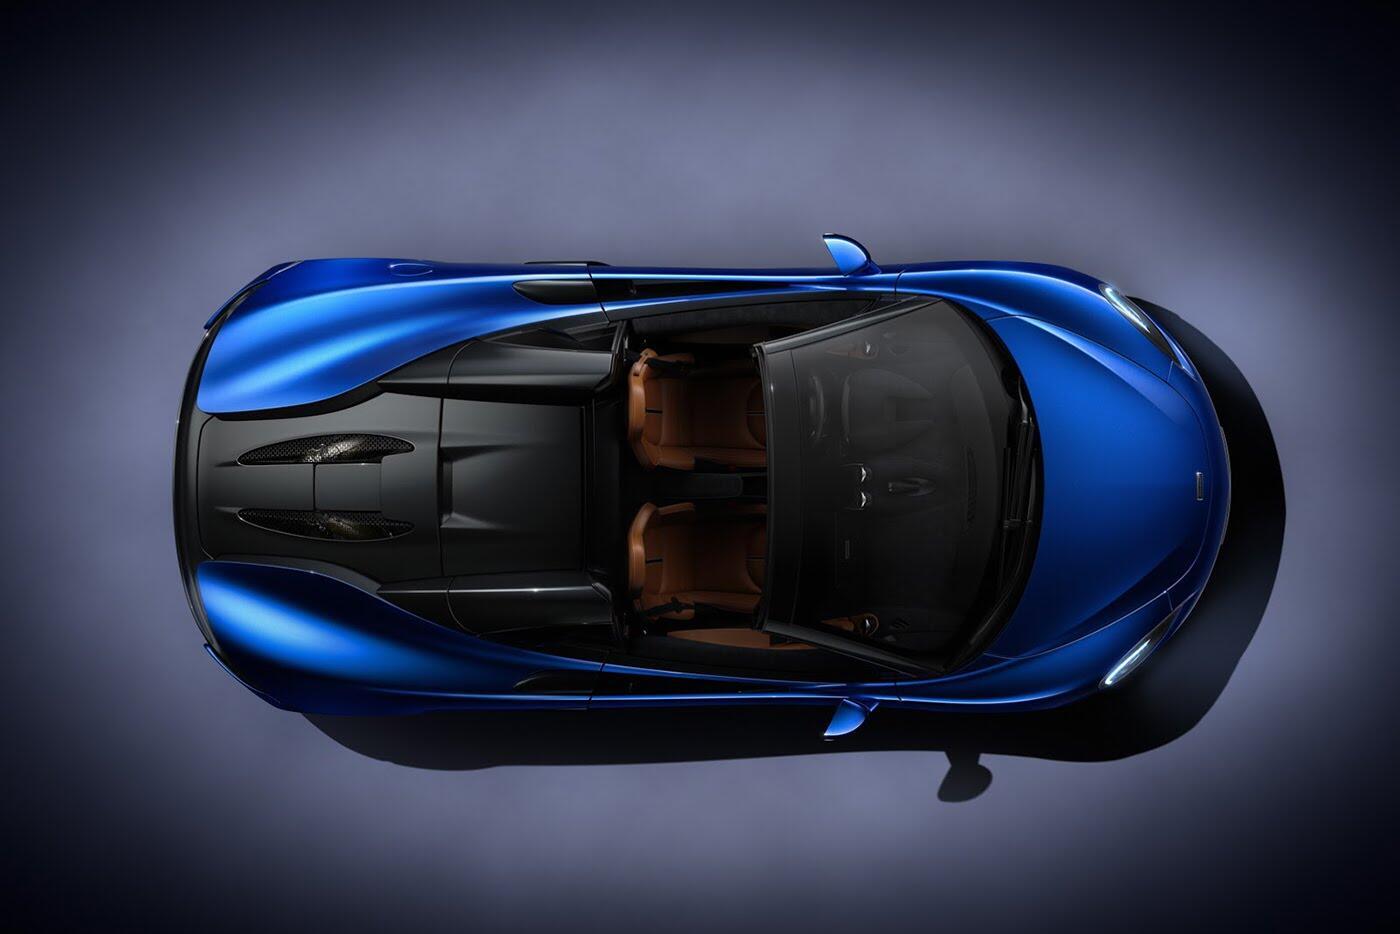 Siêu xe McLaren 570S Spider sắp ra mắt - Hình 4